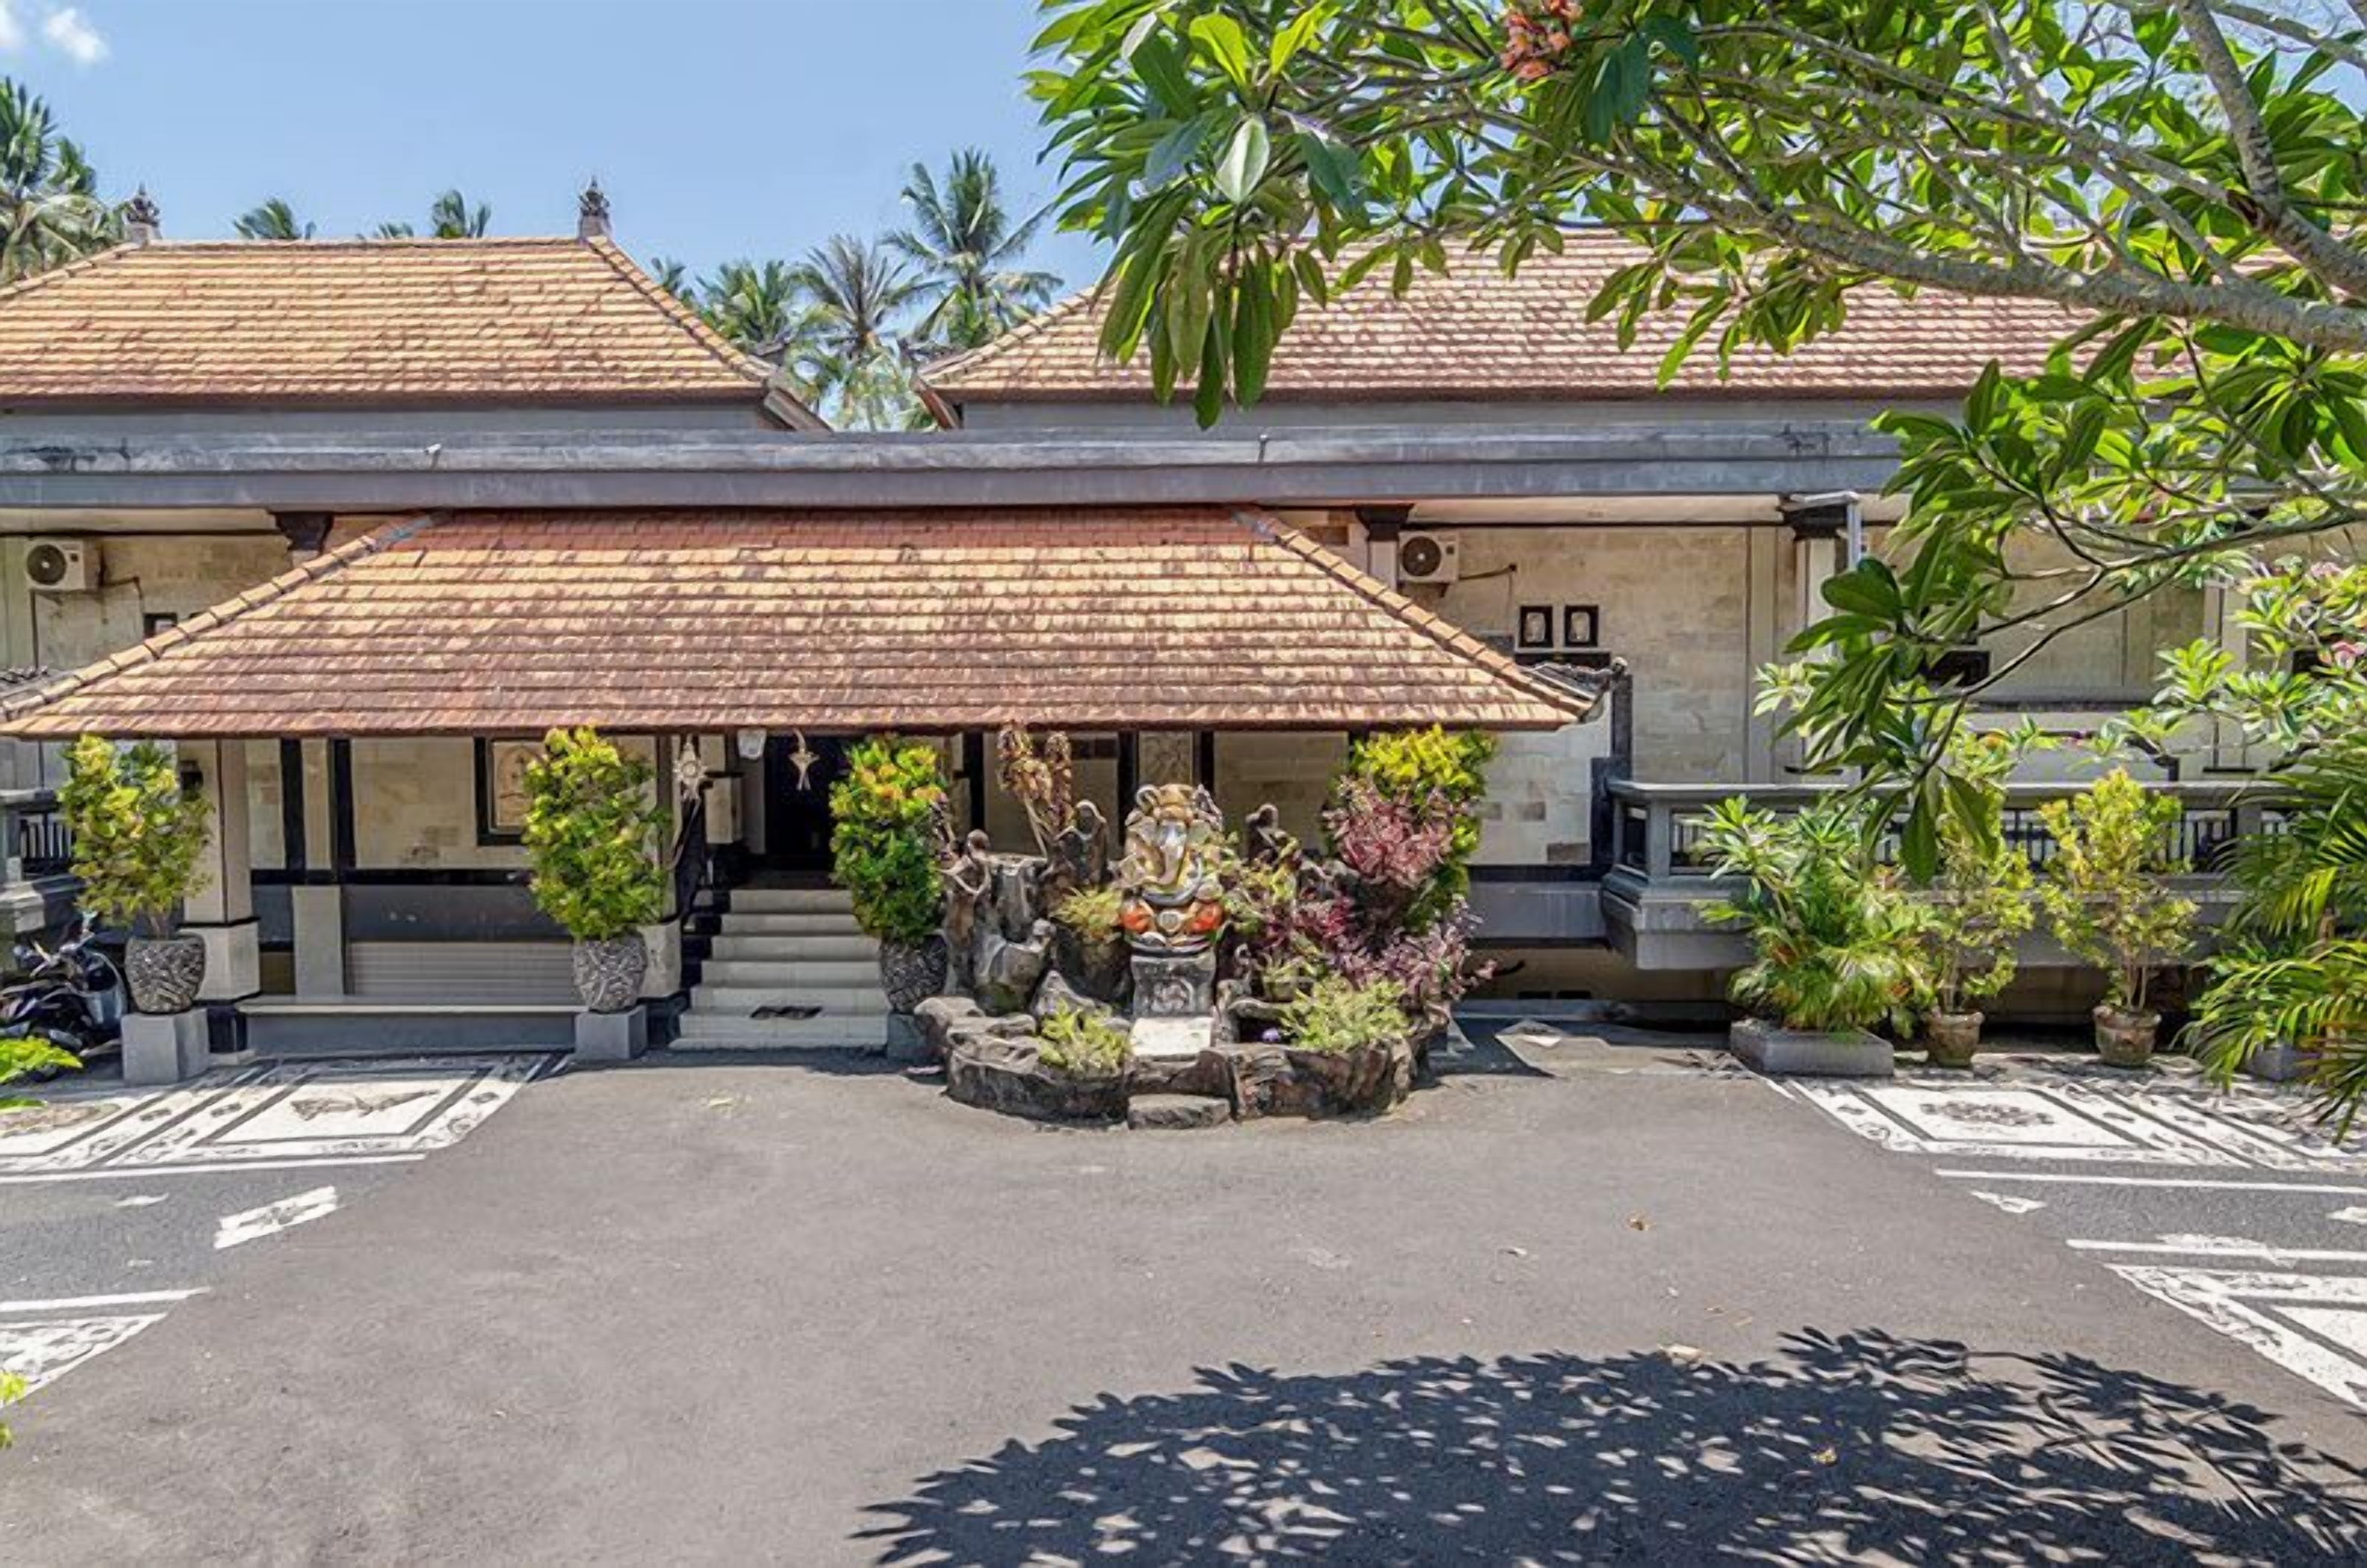 Ijo Eco Lodge